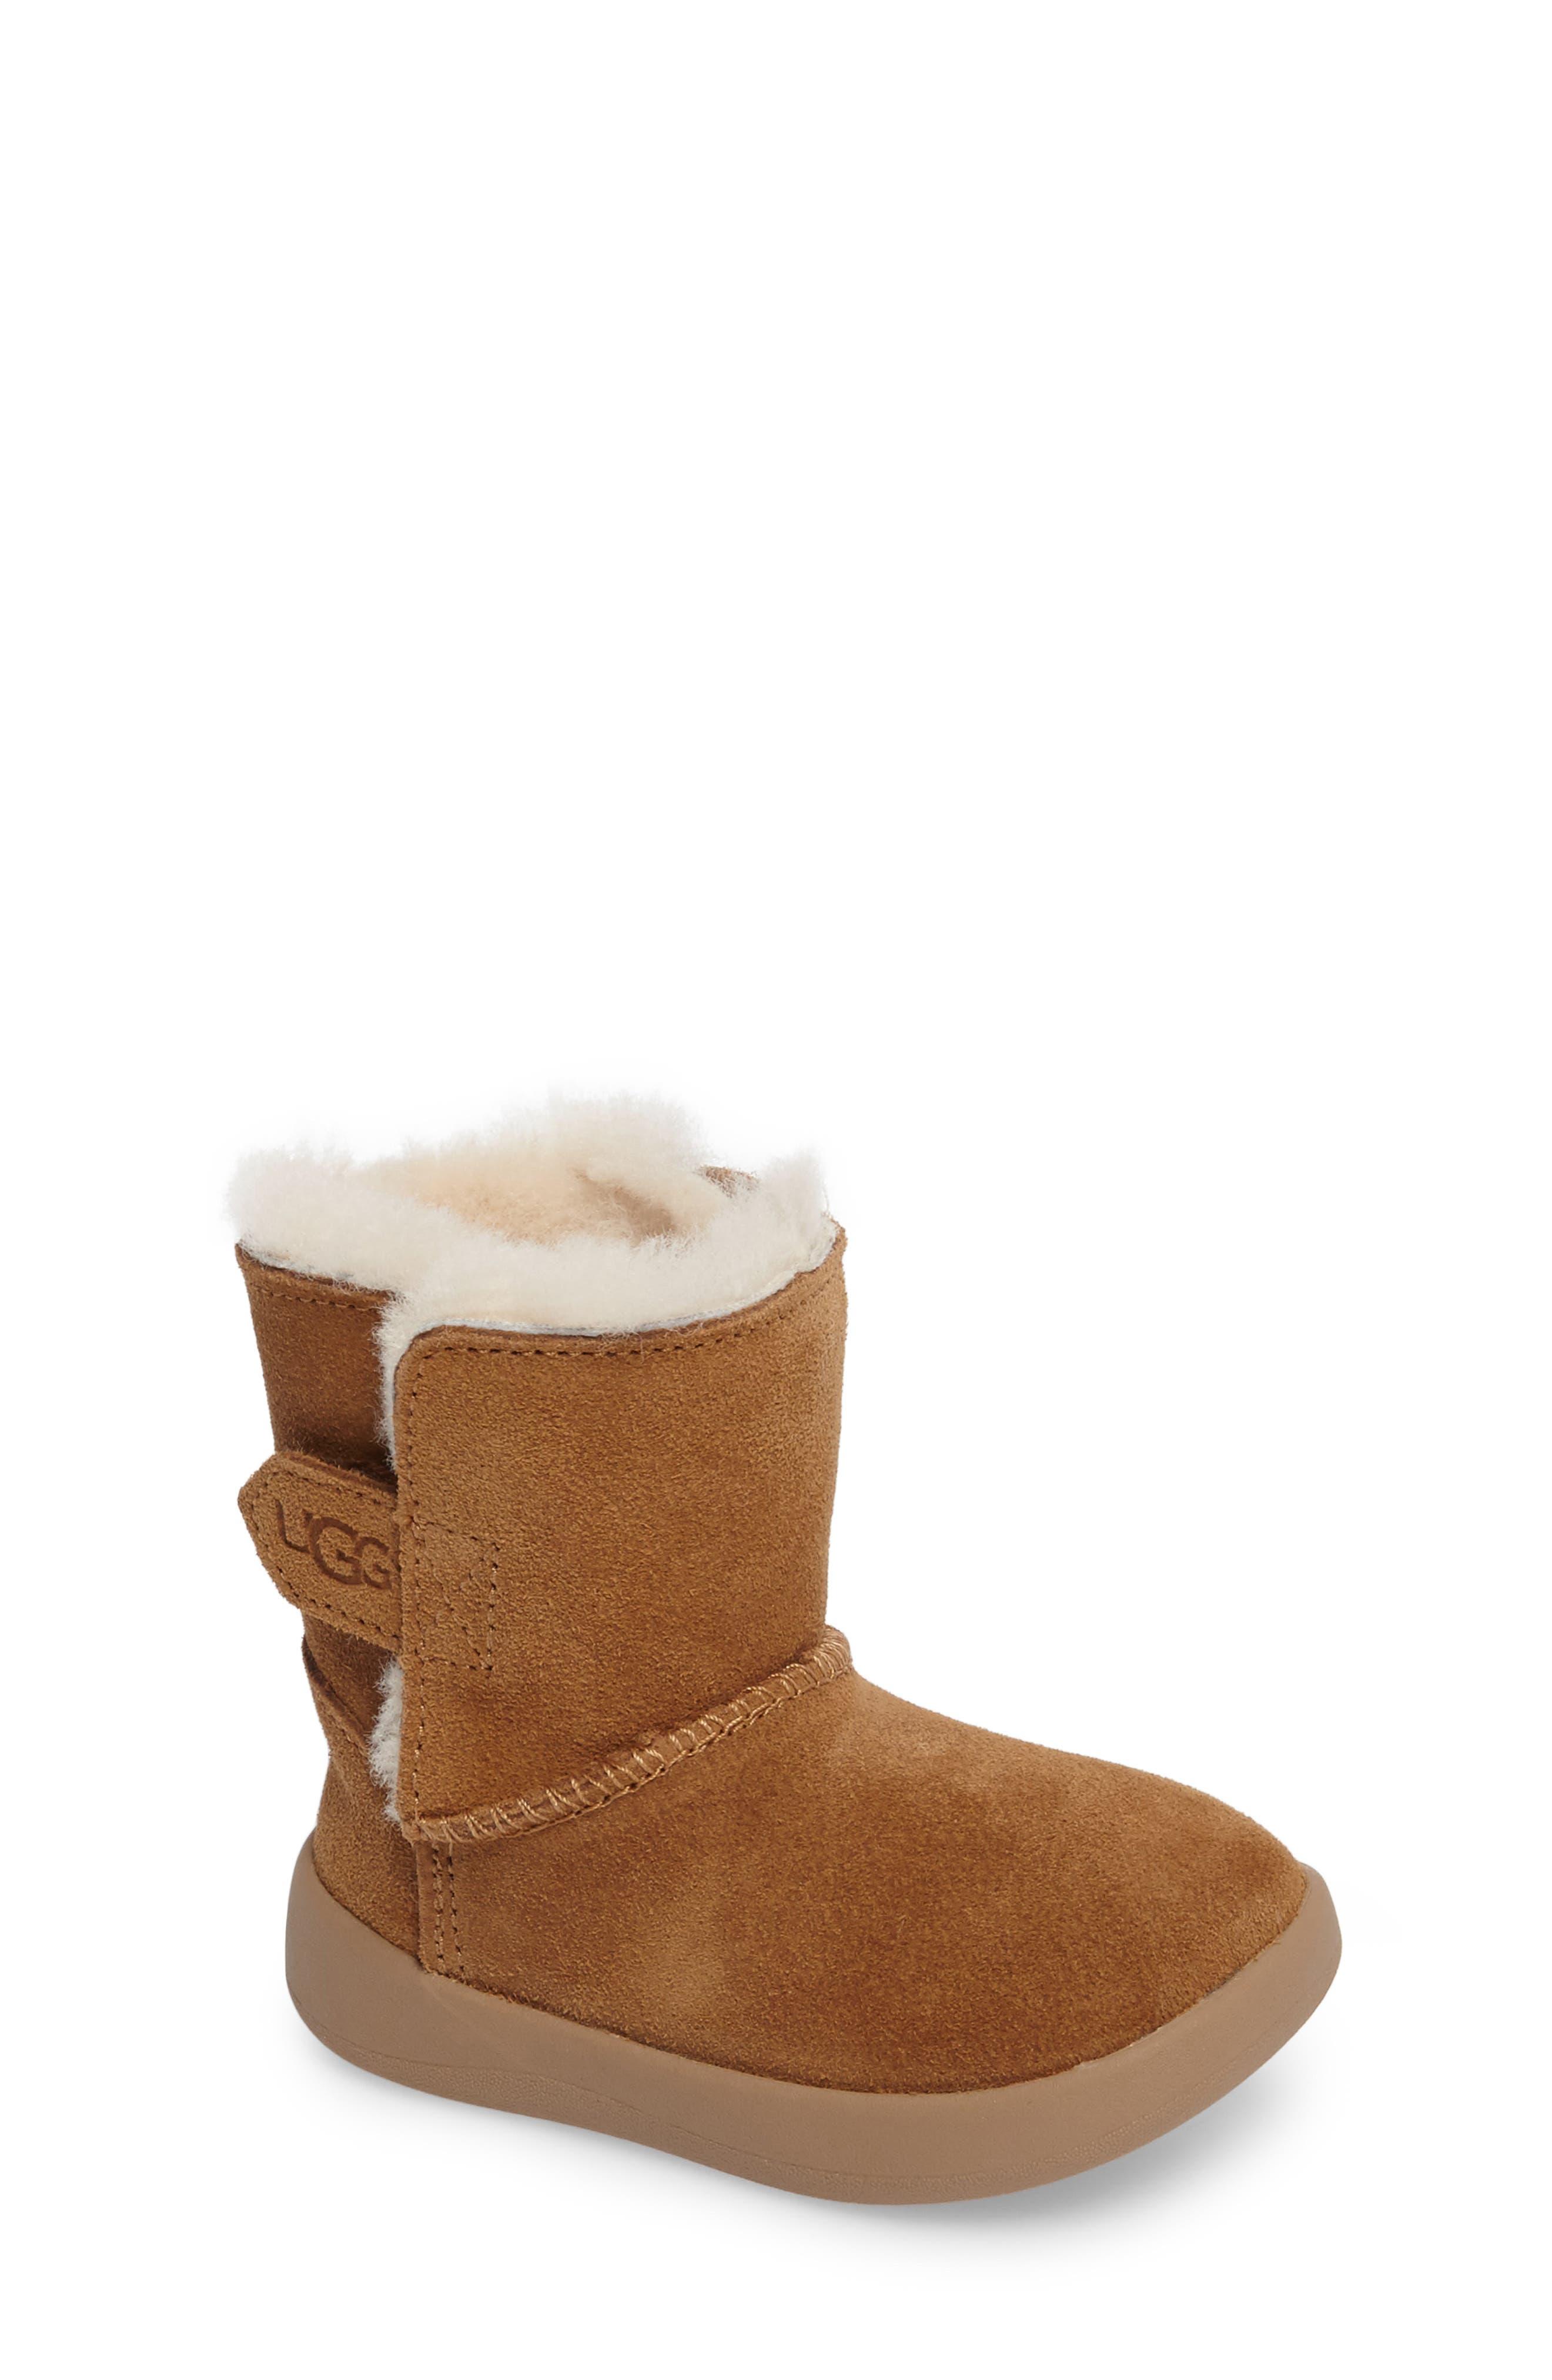 Keelan Genuine Shearling Baby Boot,                             Main thumbnail 1, color,                             CHESTNUT BROWN